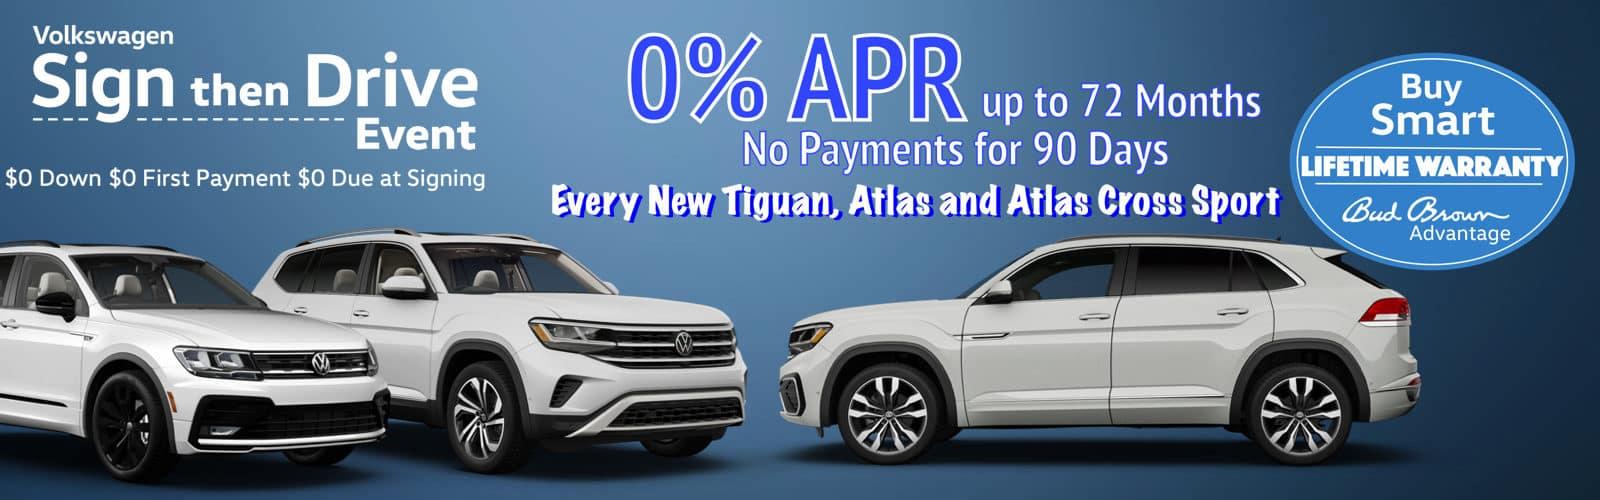 New VW SUV 0% APR offers